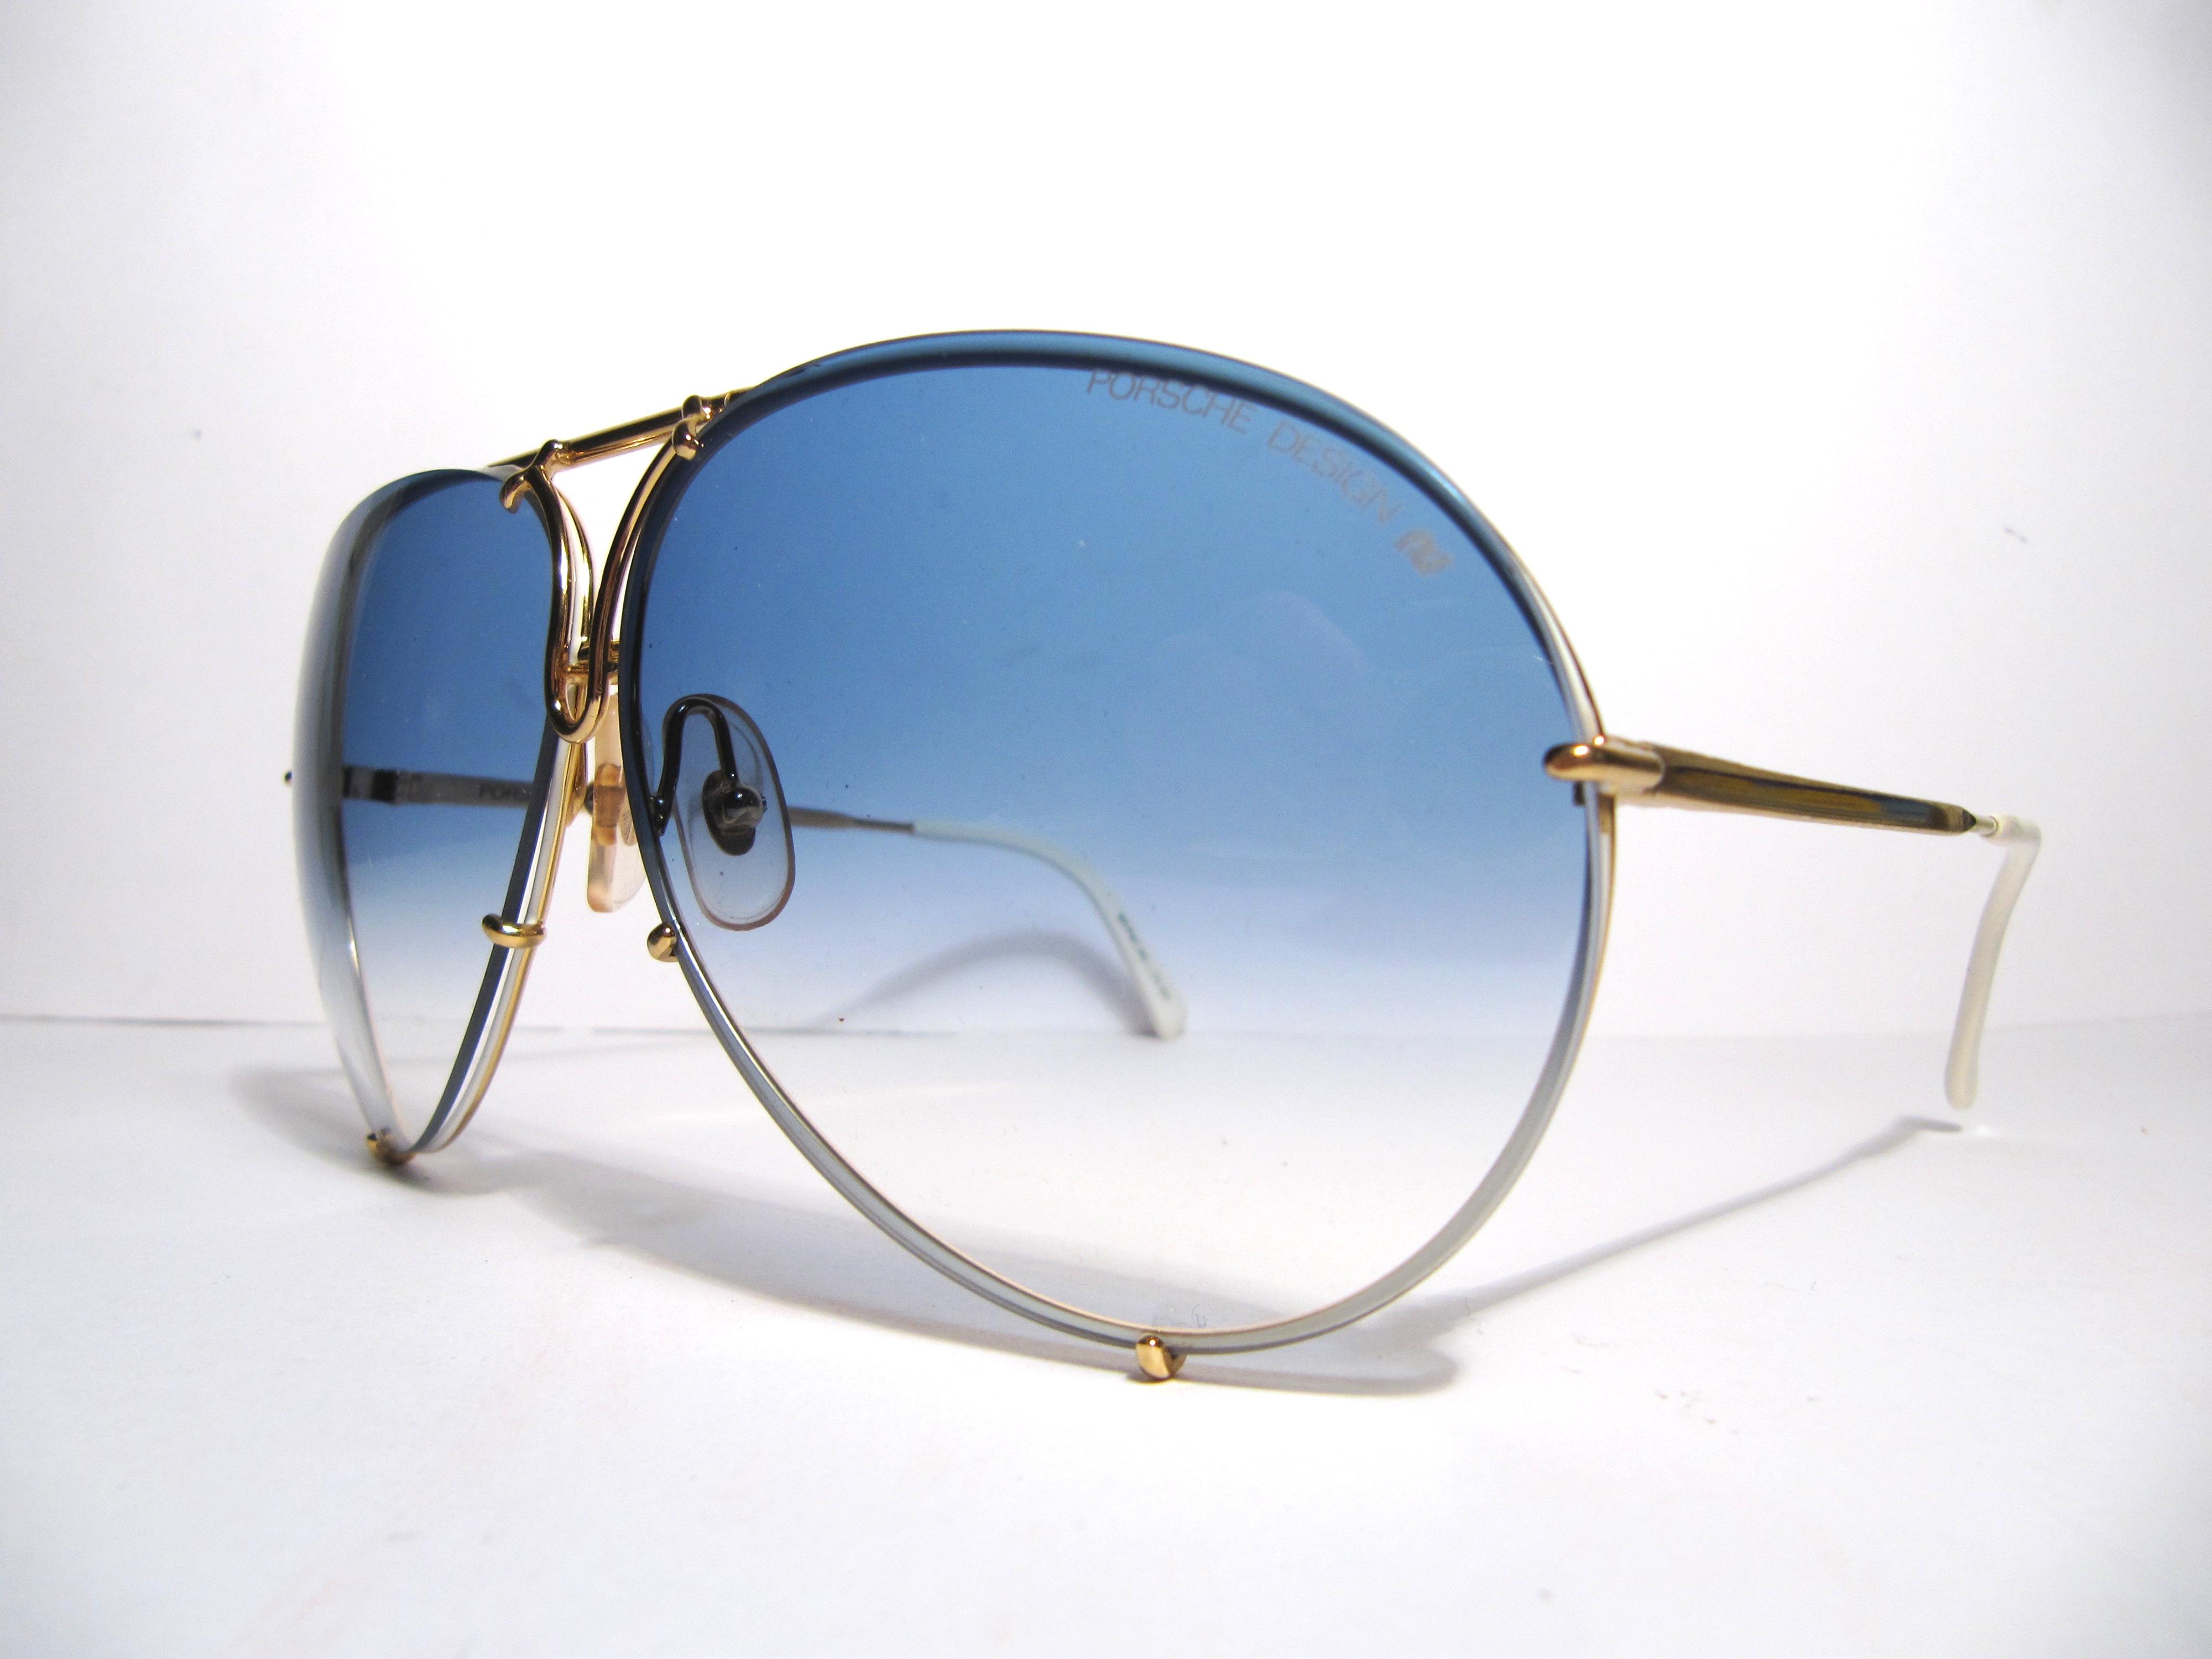 vintage carrera porsche sunglasses lenses - Sunglasses - Shopping.com